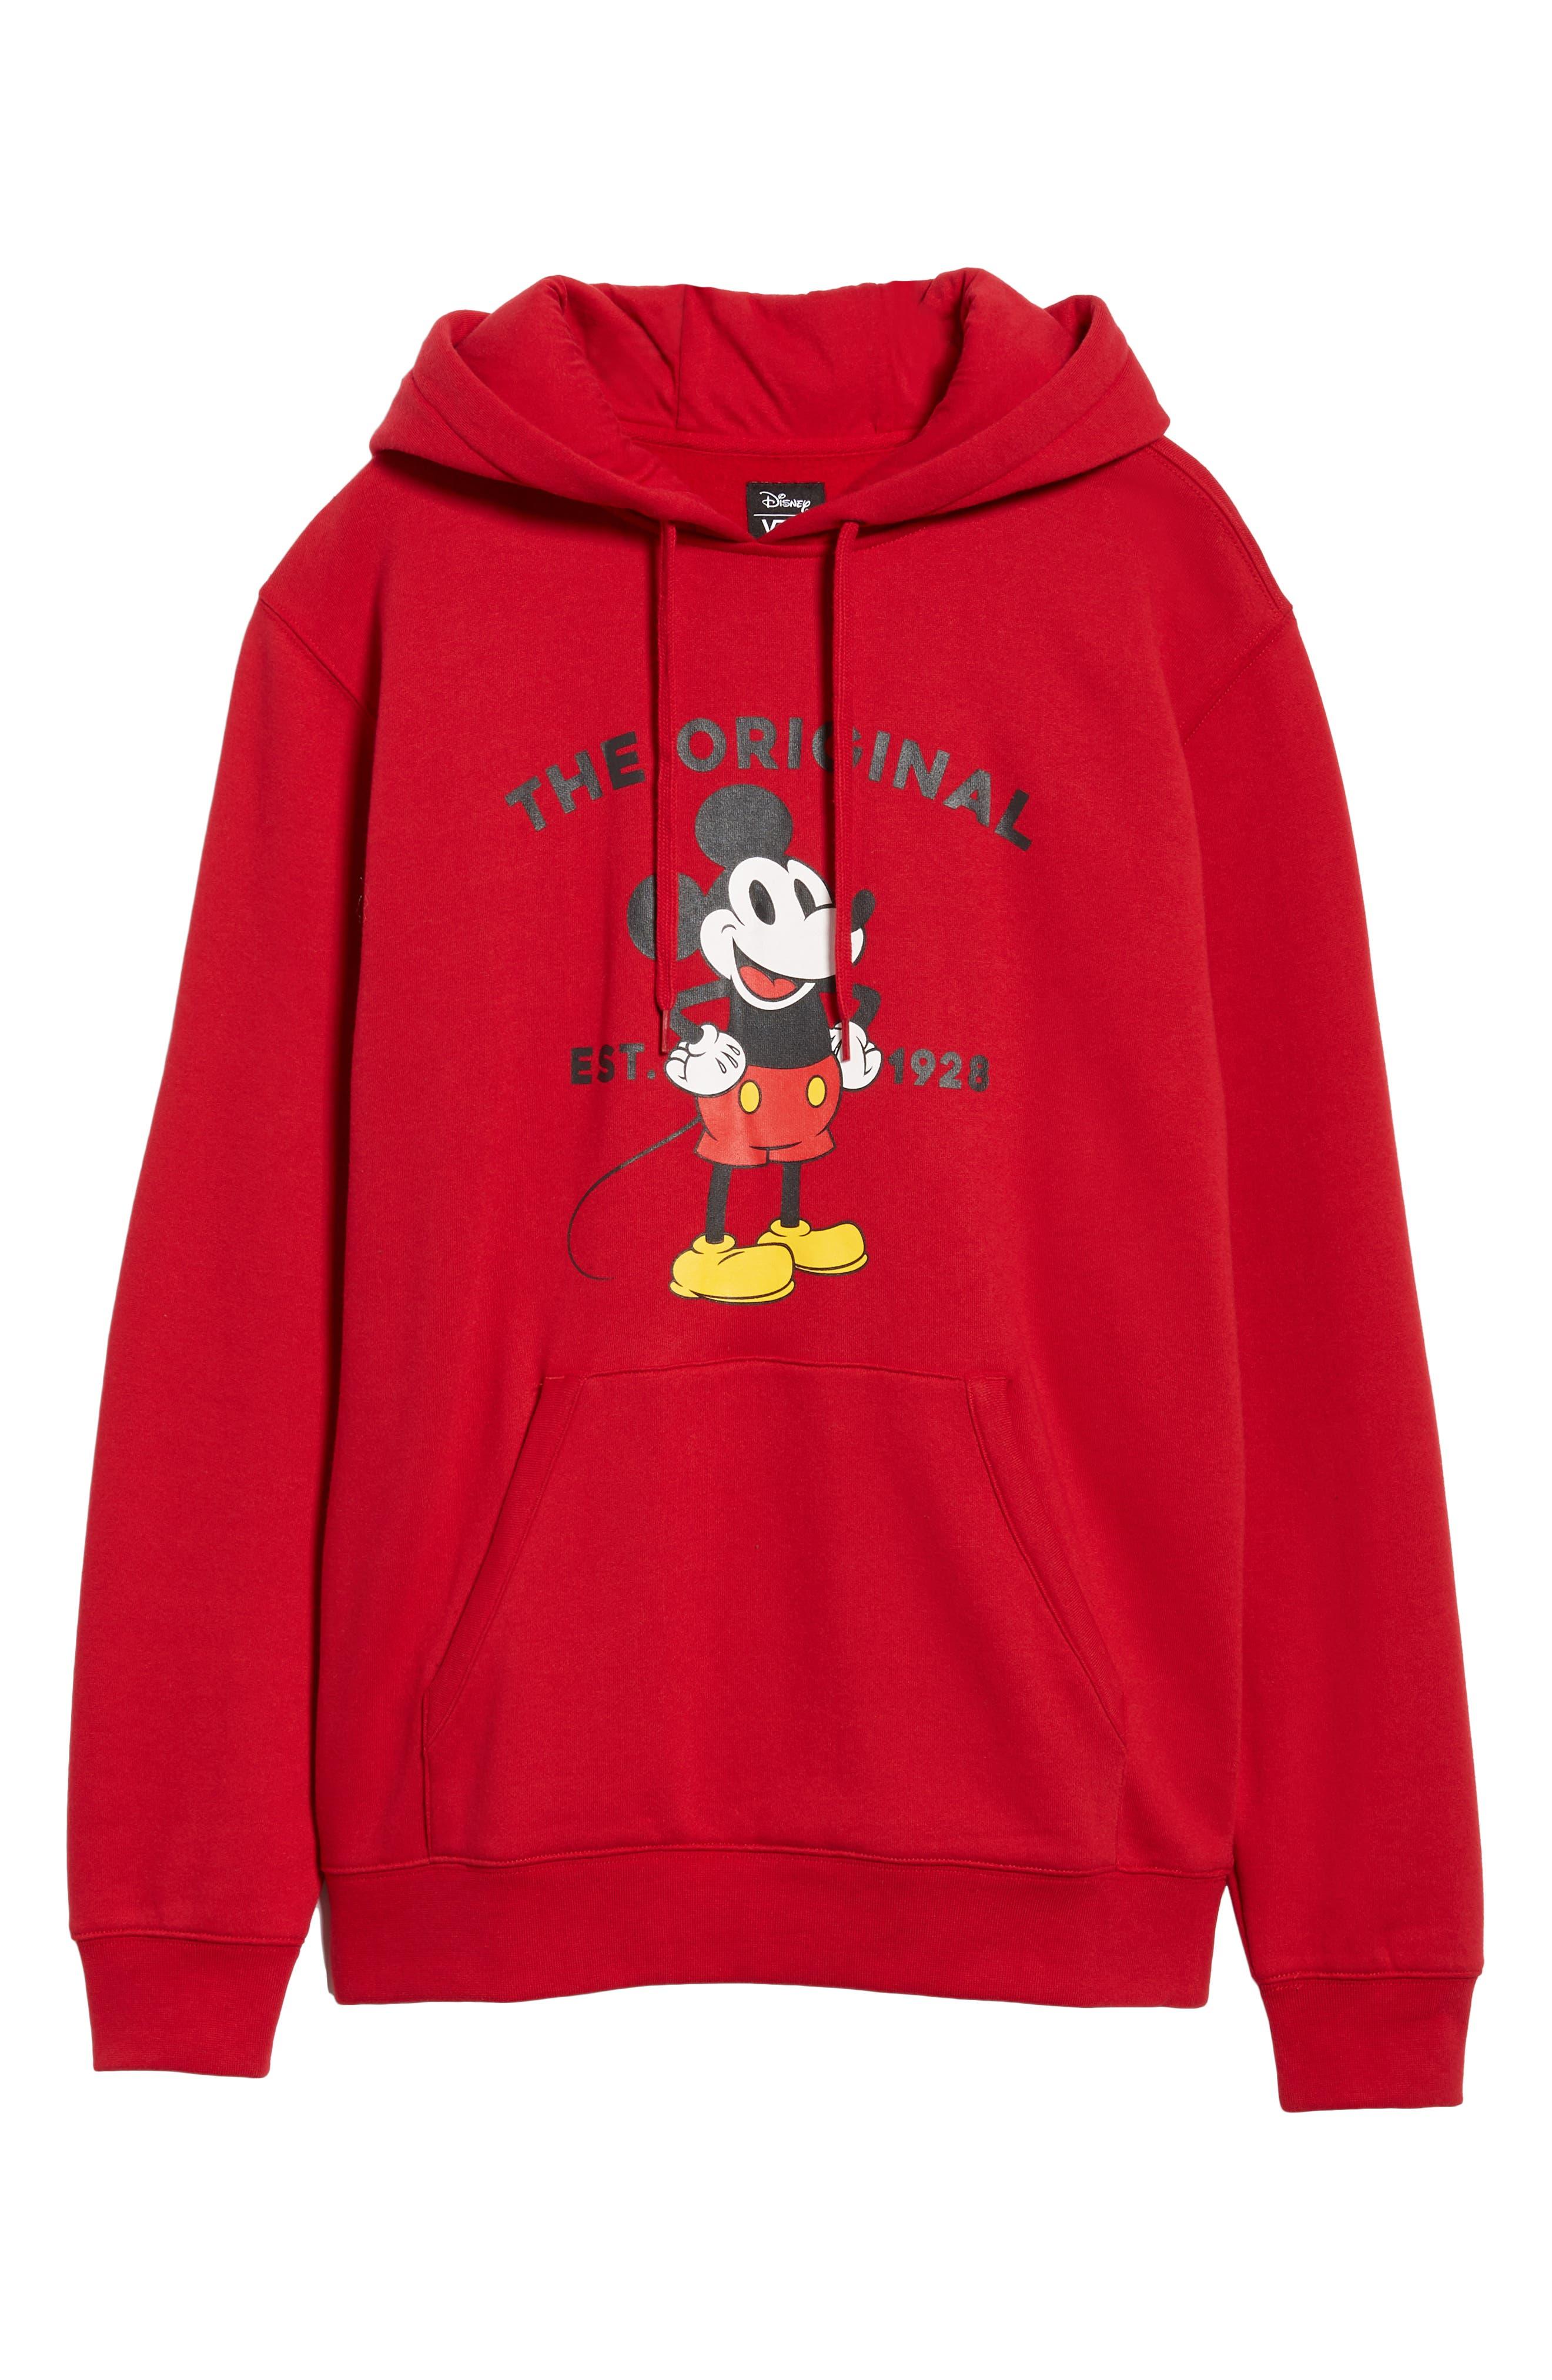 x Disney Mickey's 90th Anniversary Hoodie,                             Alternate thumbnail 6, color,                             601